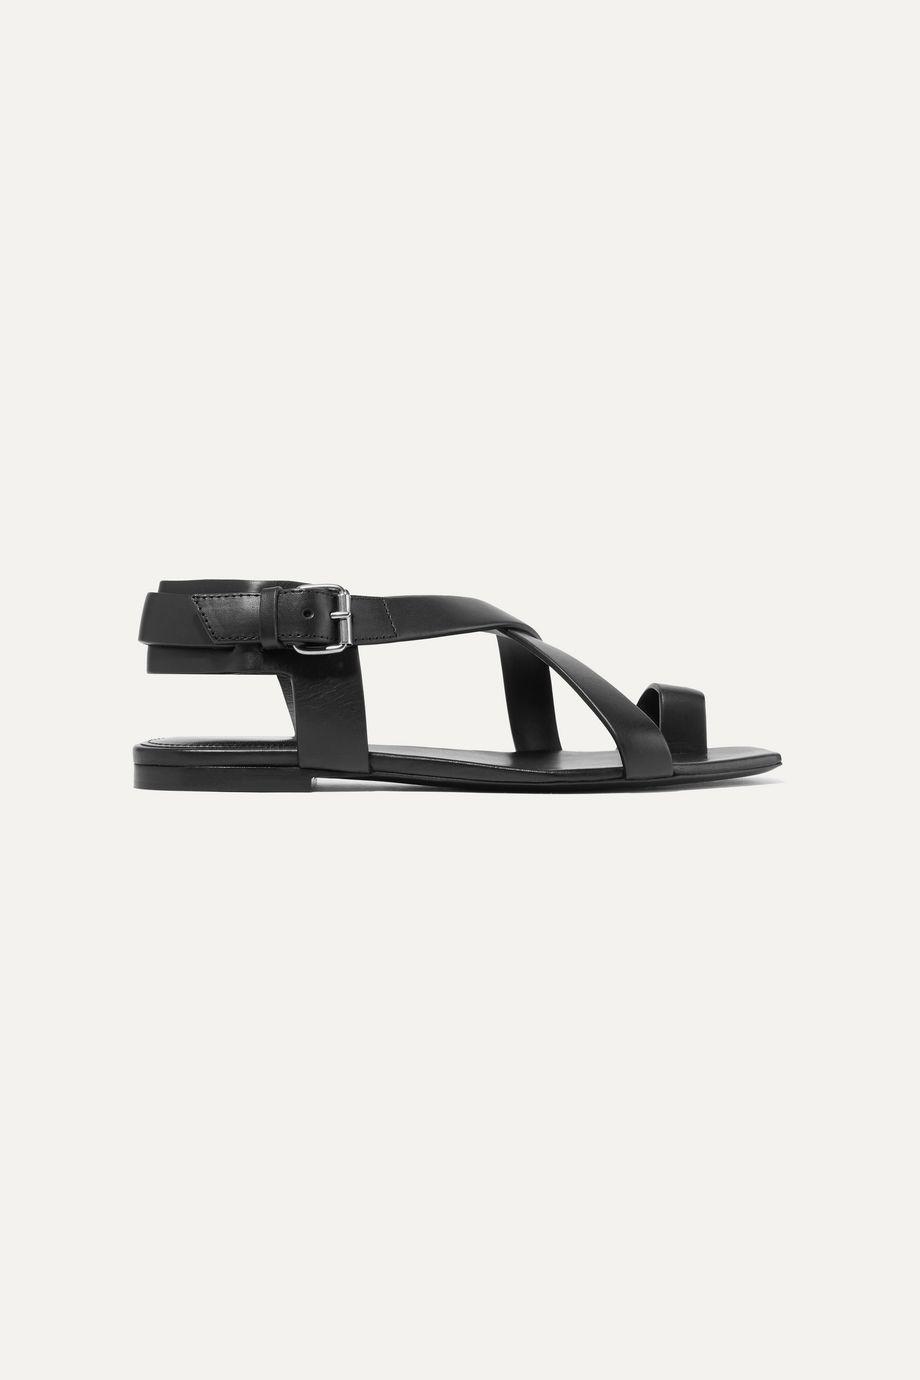 SAINT LAURENT Hiandra leather sandals